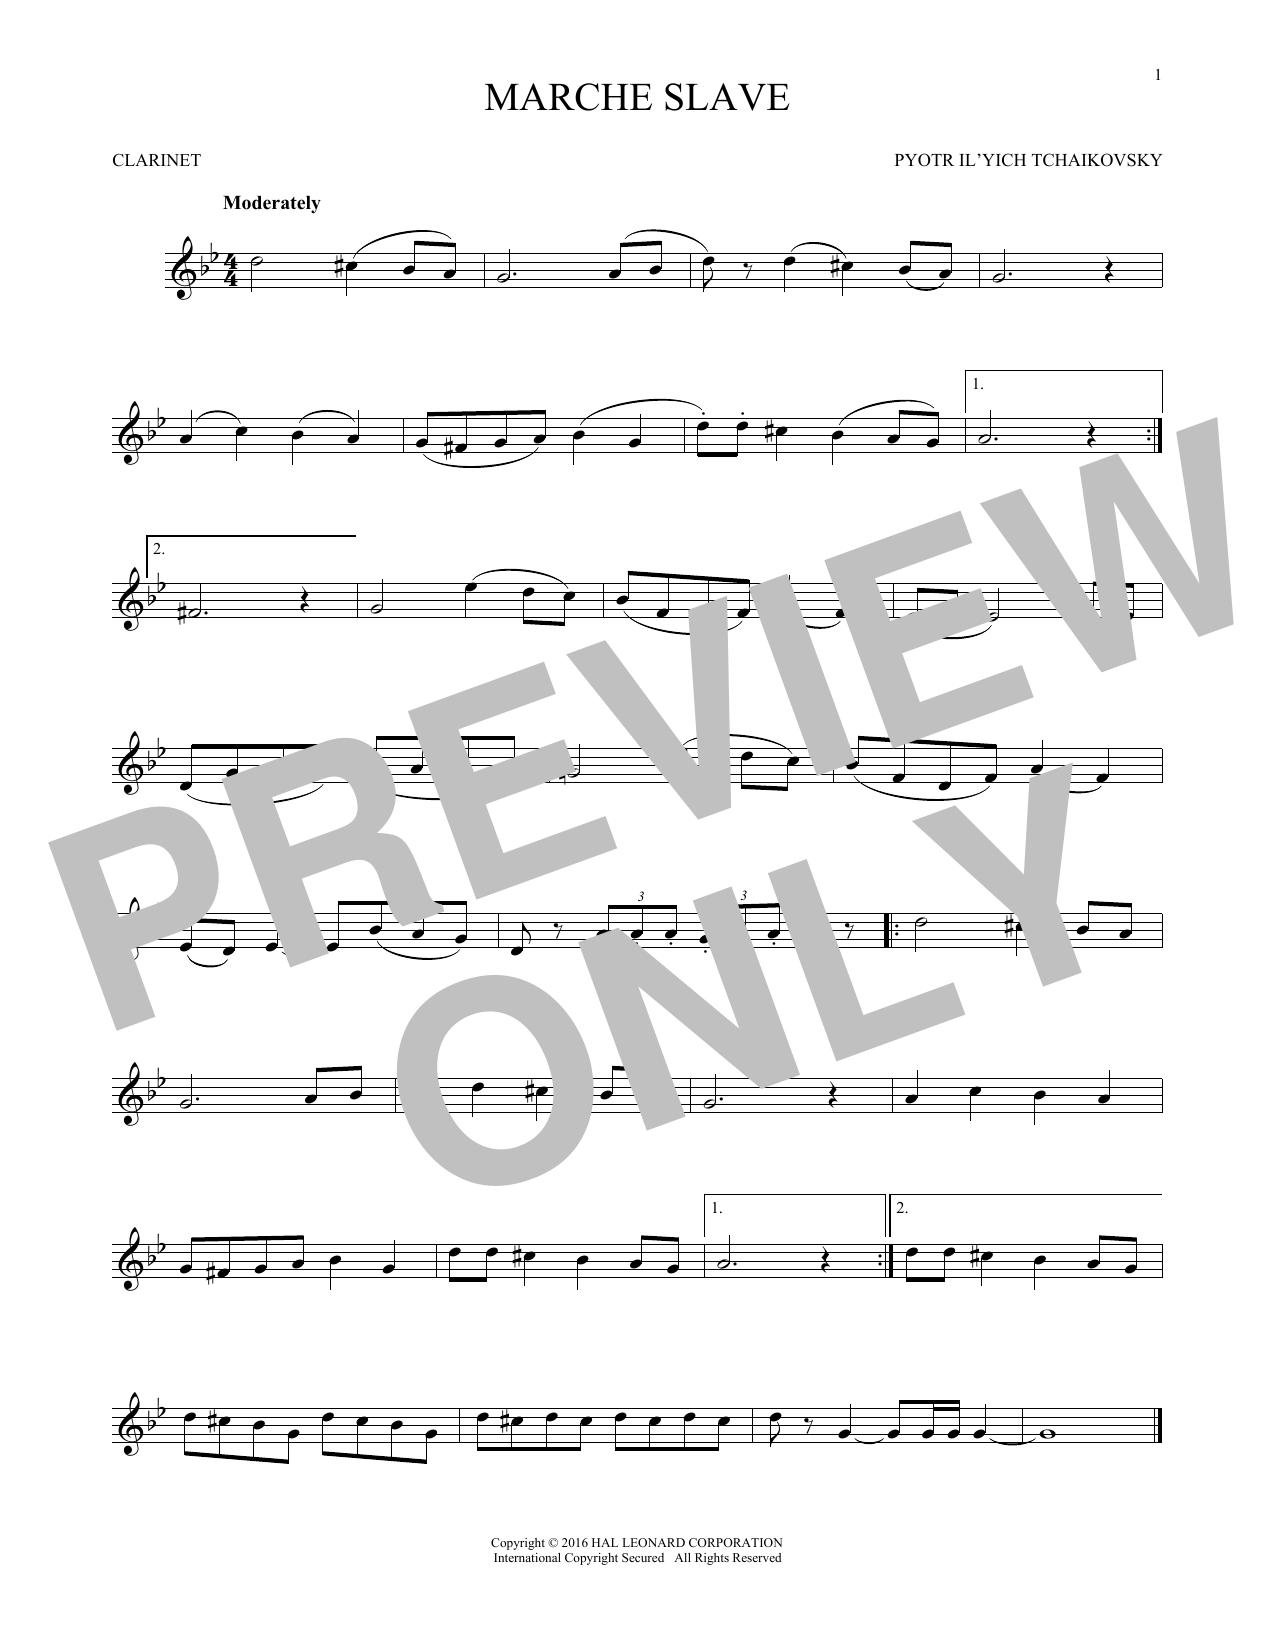 Marche Slav, Op. 31 (Clarinet Solo)